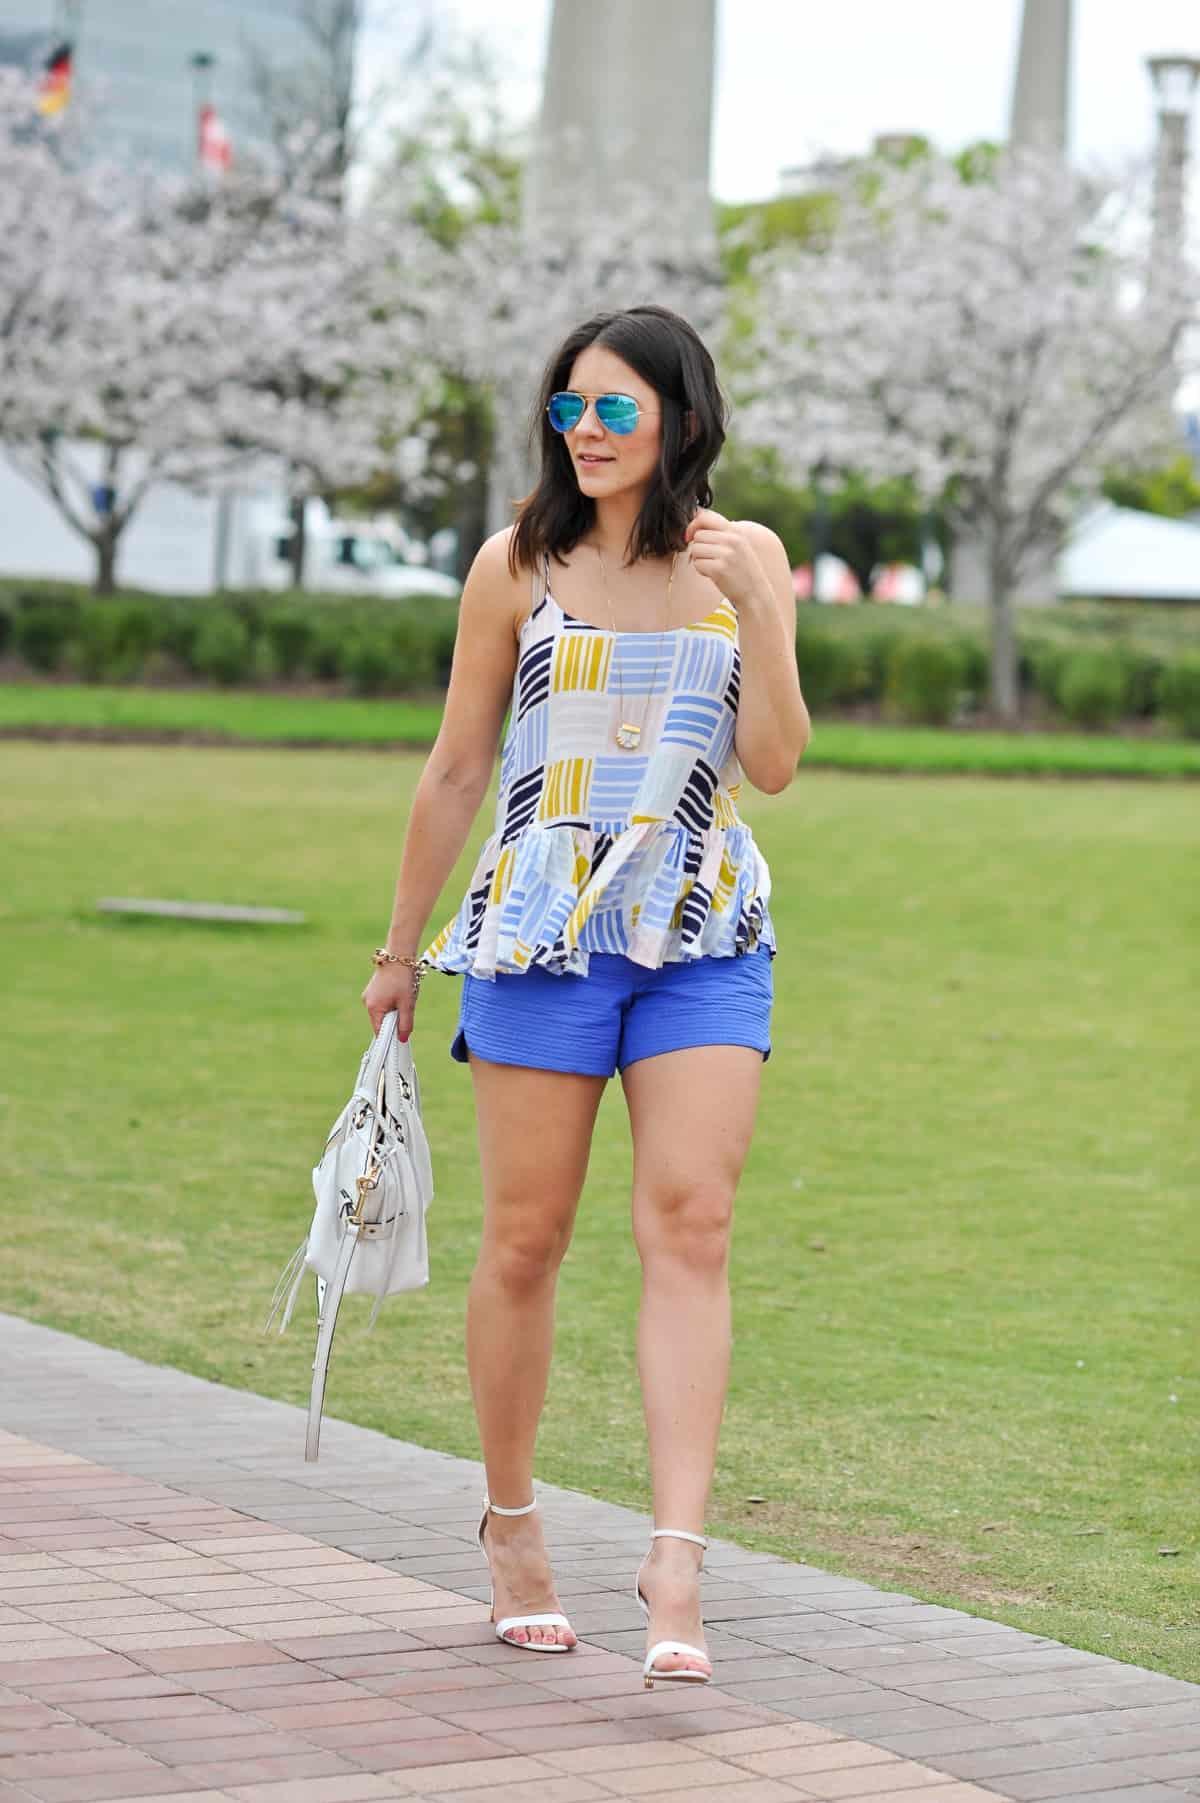 Old Navy printed peplum tank - summer outfit ideas - My Style Vita - @mystylevita - 3